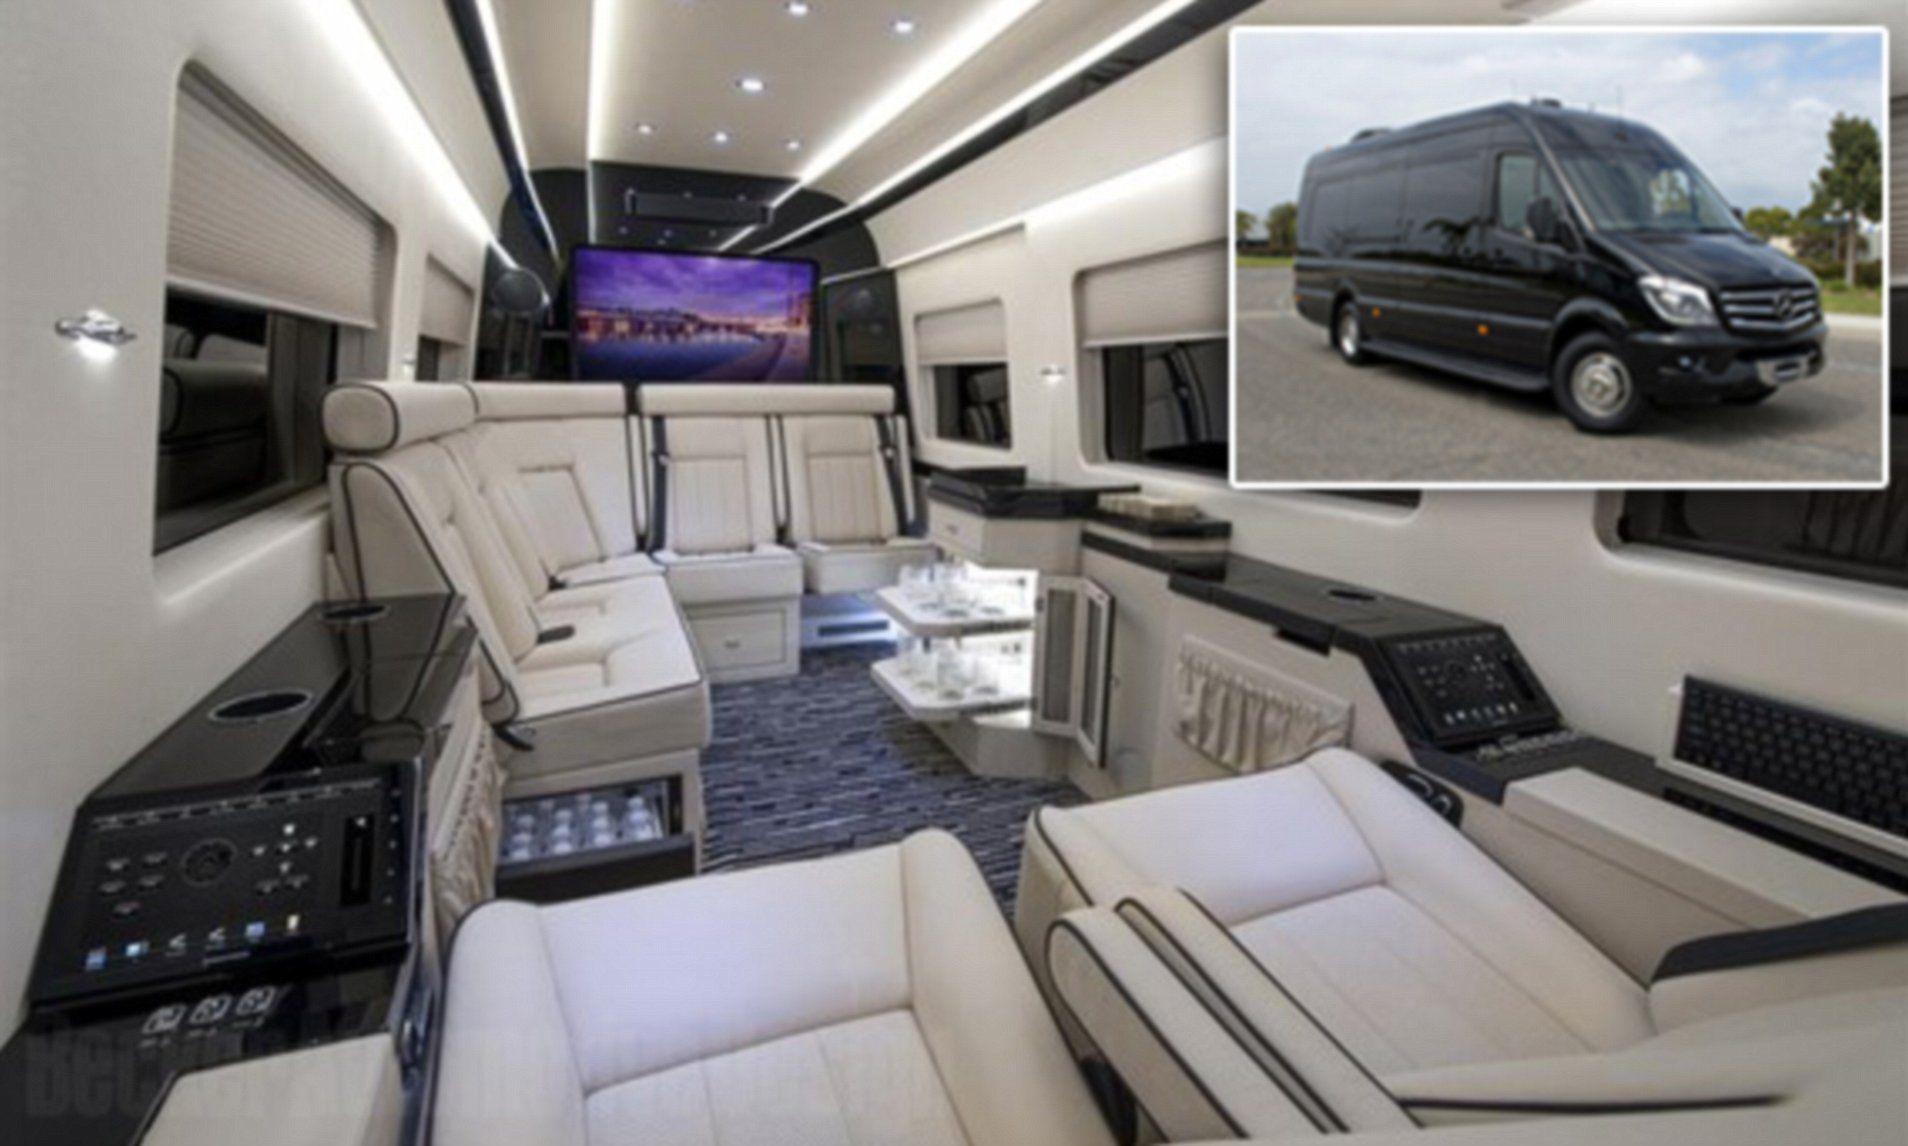 Vantastic Inside The 400 000 Mercedes Private Jet Of Vans In